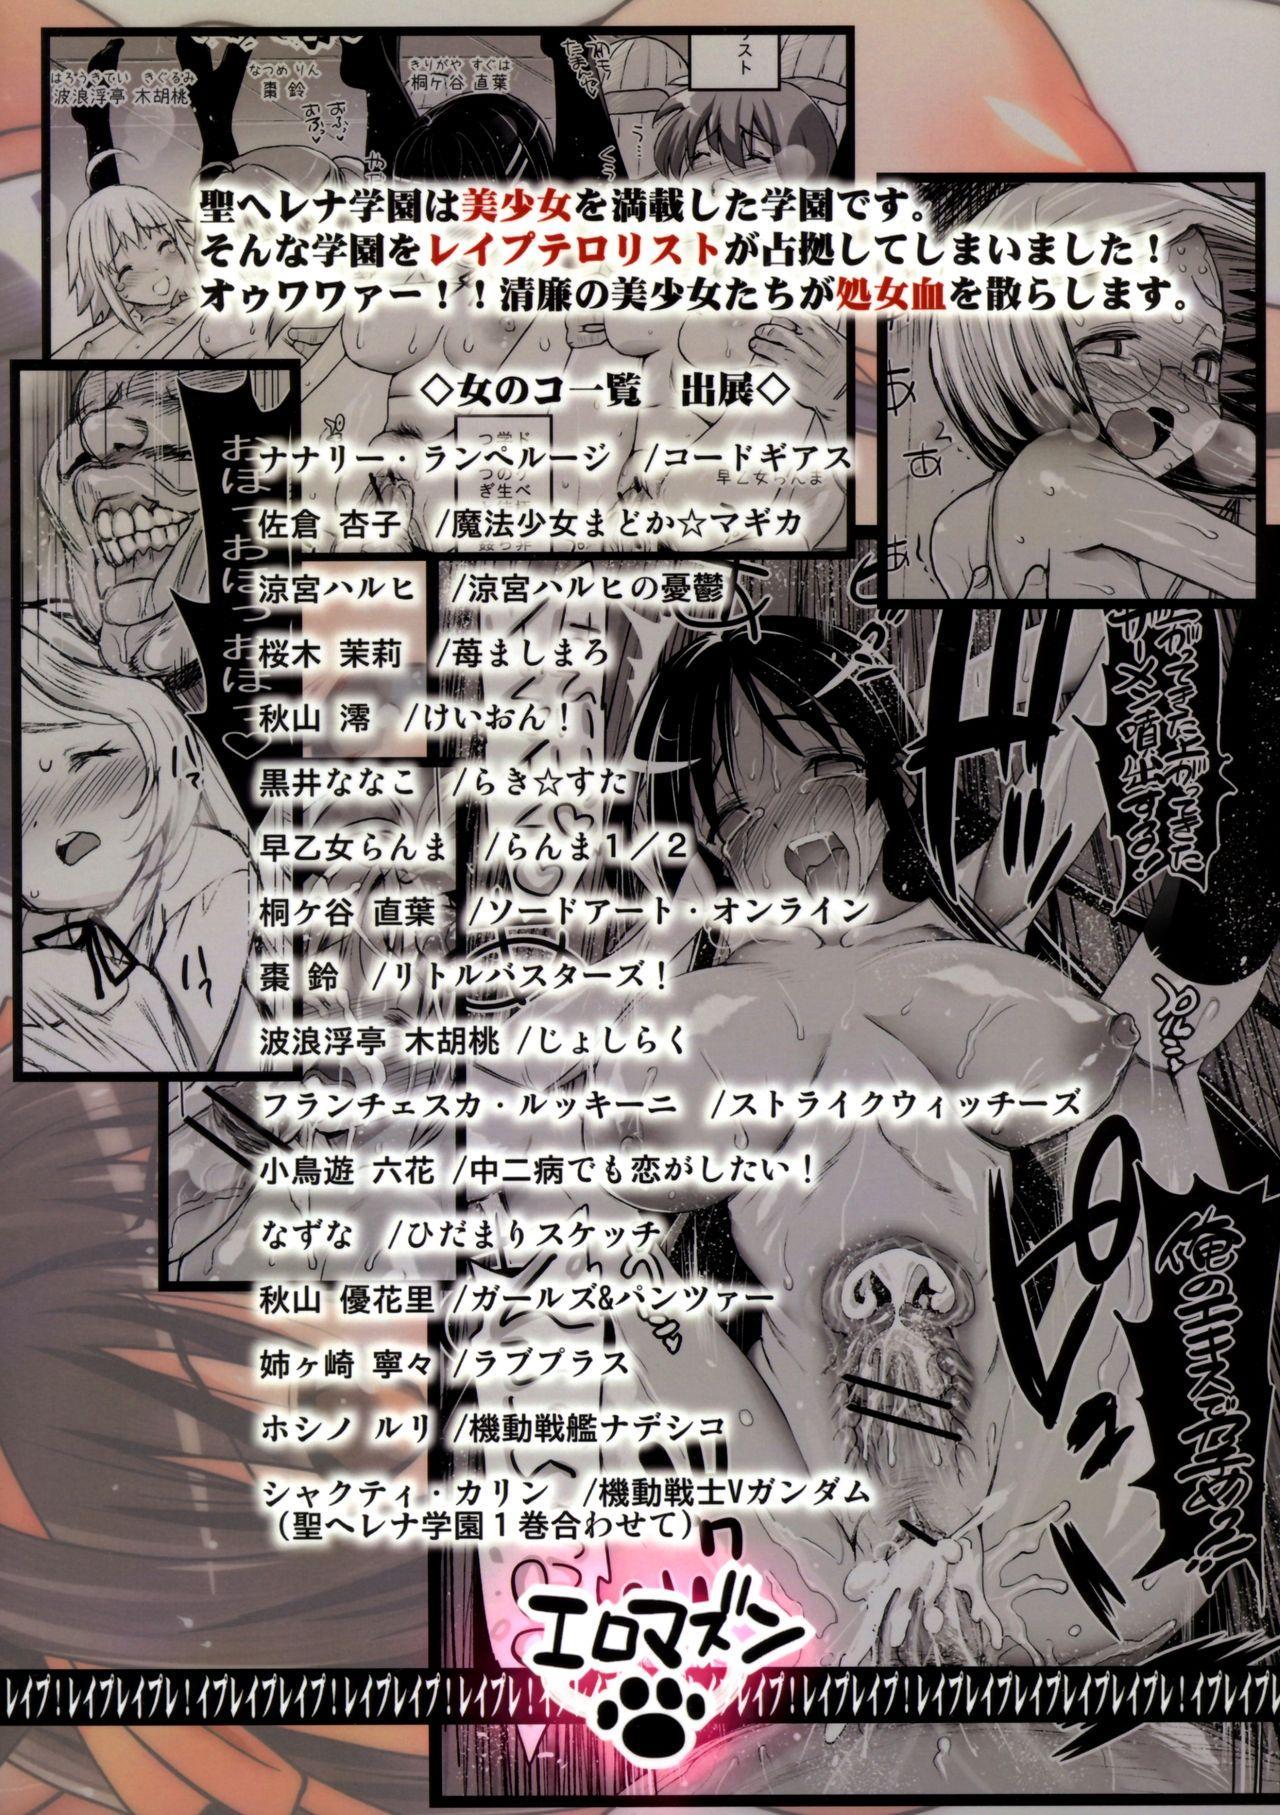 [Eromazun (Ma-Kurou)] Saint Helena Gakuen 2 ~ Terrorist ni Senkyosareta Jogakuen de Rape Matsuri!~   Saint Helena Academy 2 ~A School Occupied by Terrorists Becomes a Rape Festival!~ (Various) [English] [B.E.C. Scans] 47